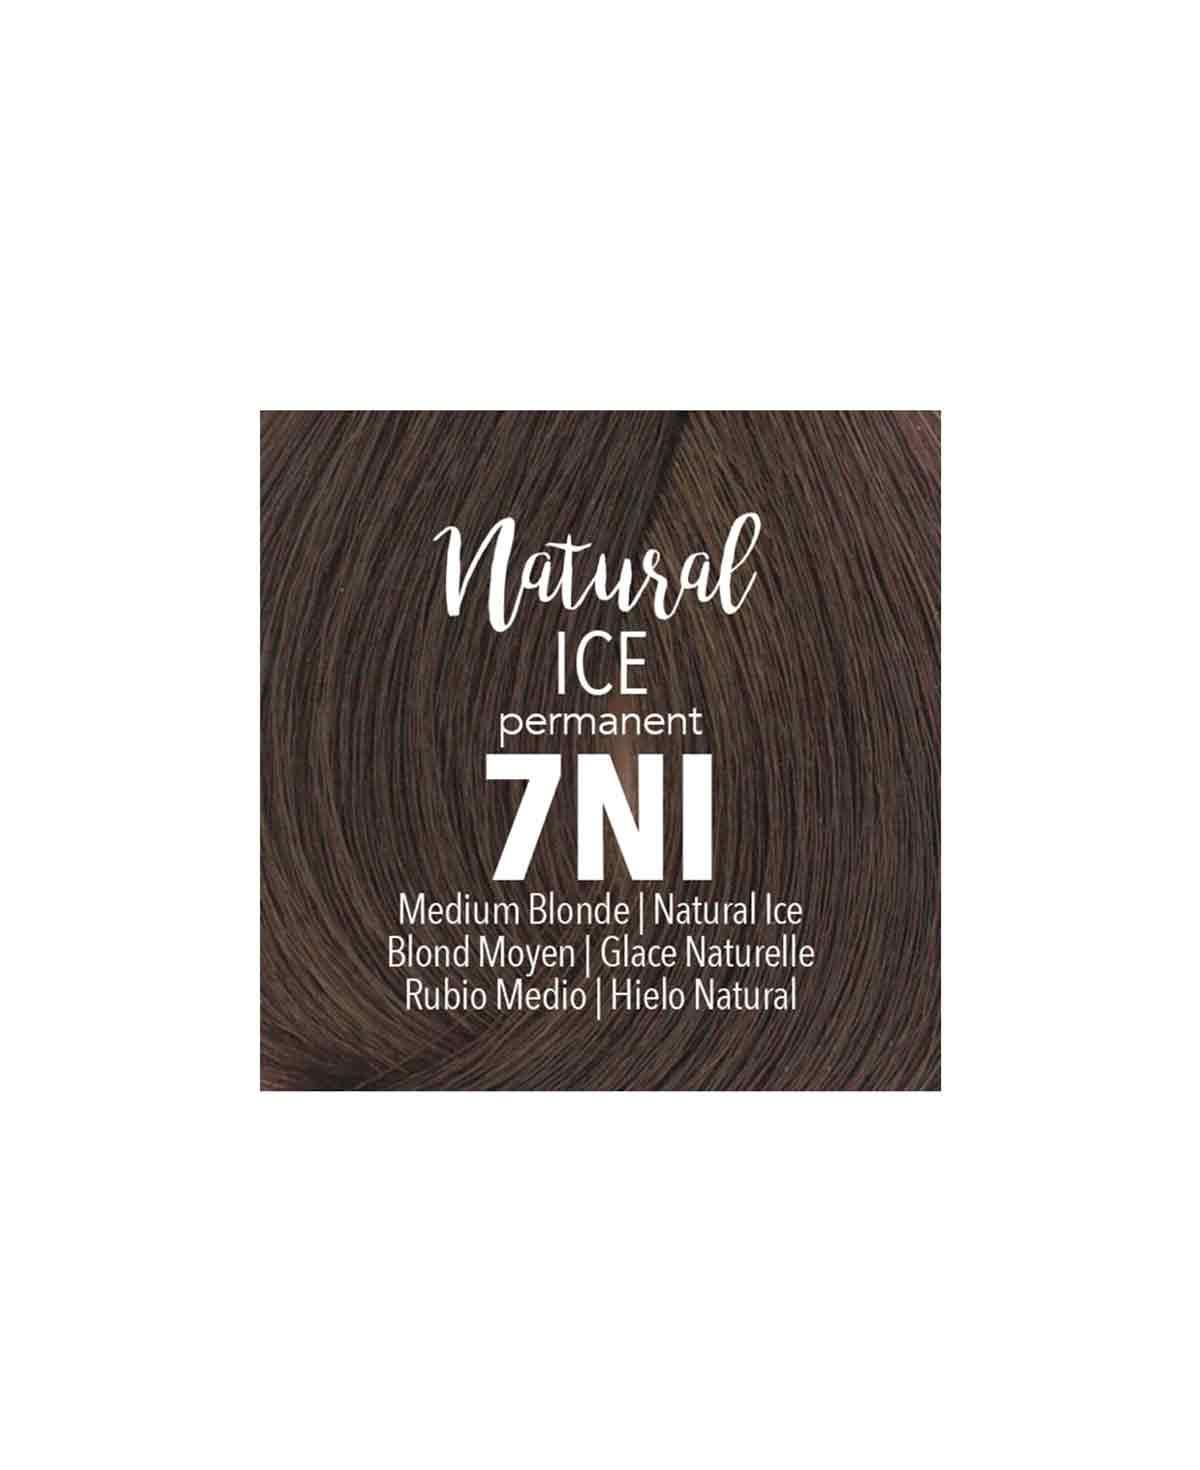 Mydentity - 7NI Medium Blonde Natural Ice